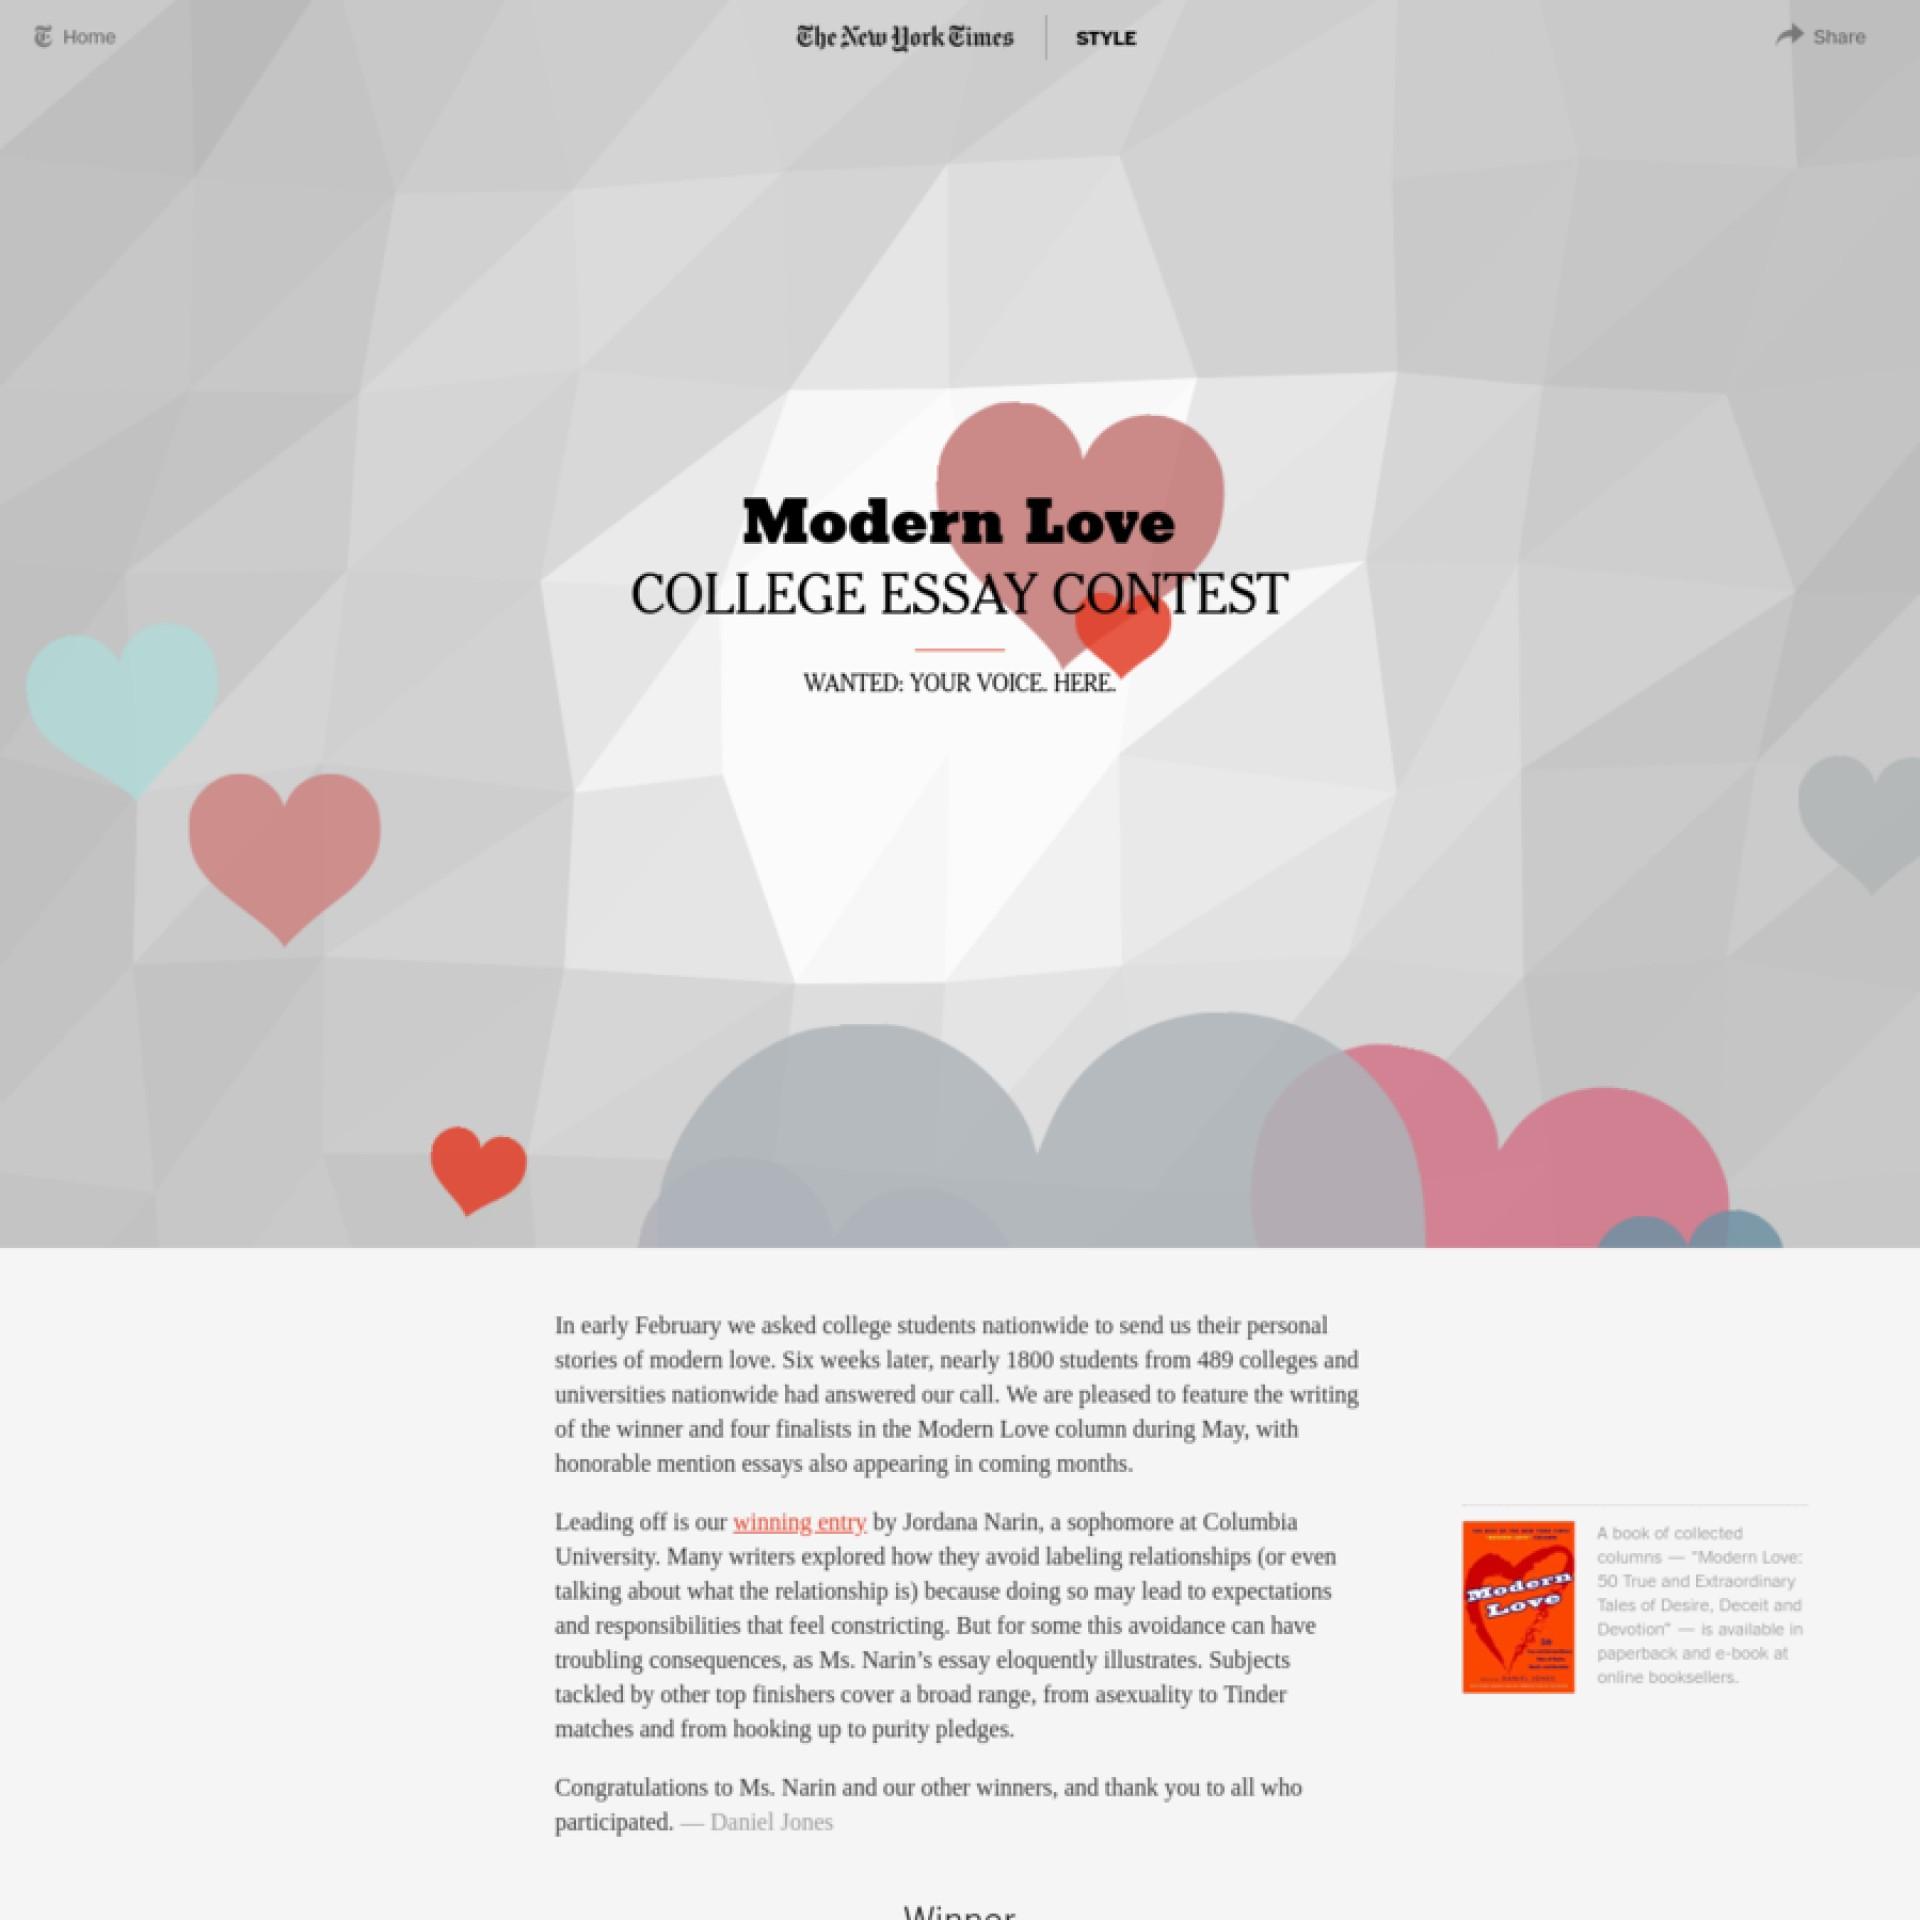 011 Large 9c7cbb98d14cce0731e1794ebb29986f1534592219 Essay Example Modern Love Phenomenal Essays Contest Winner Amy Rosenthal 1920